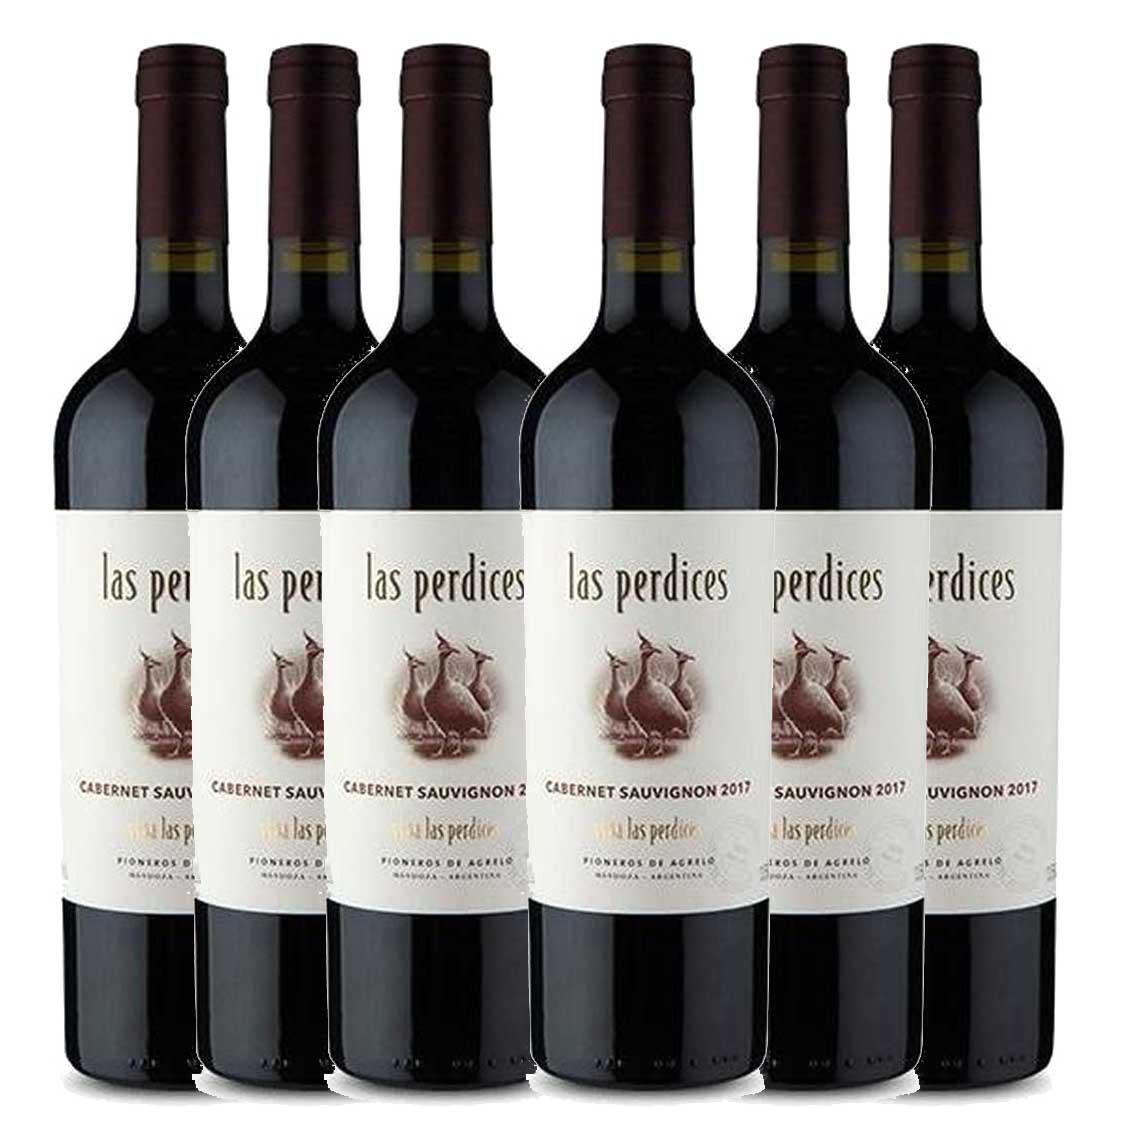 Kit 6x Vinho Tinto Argentino Las Perdices Cabernet Sauvignon 2019